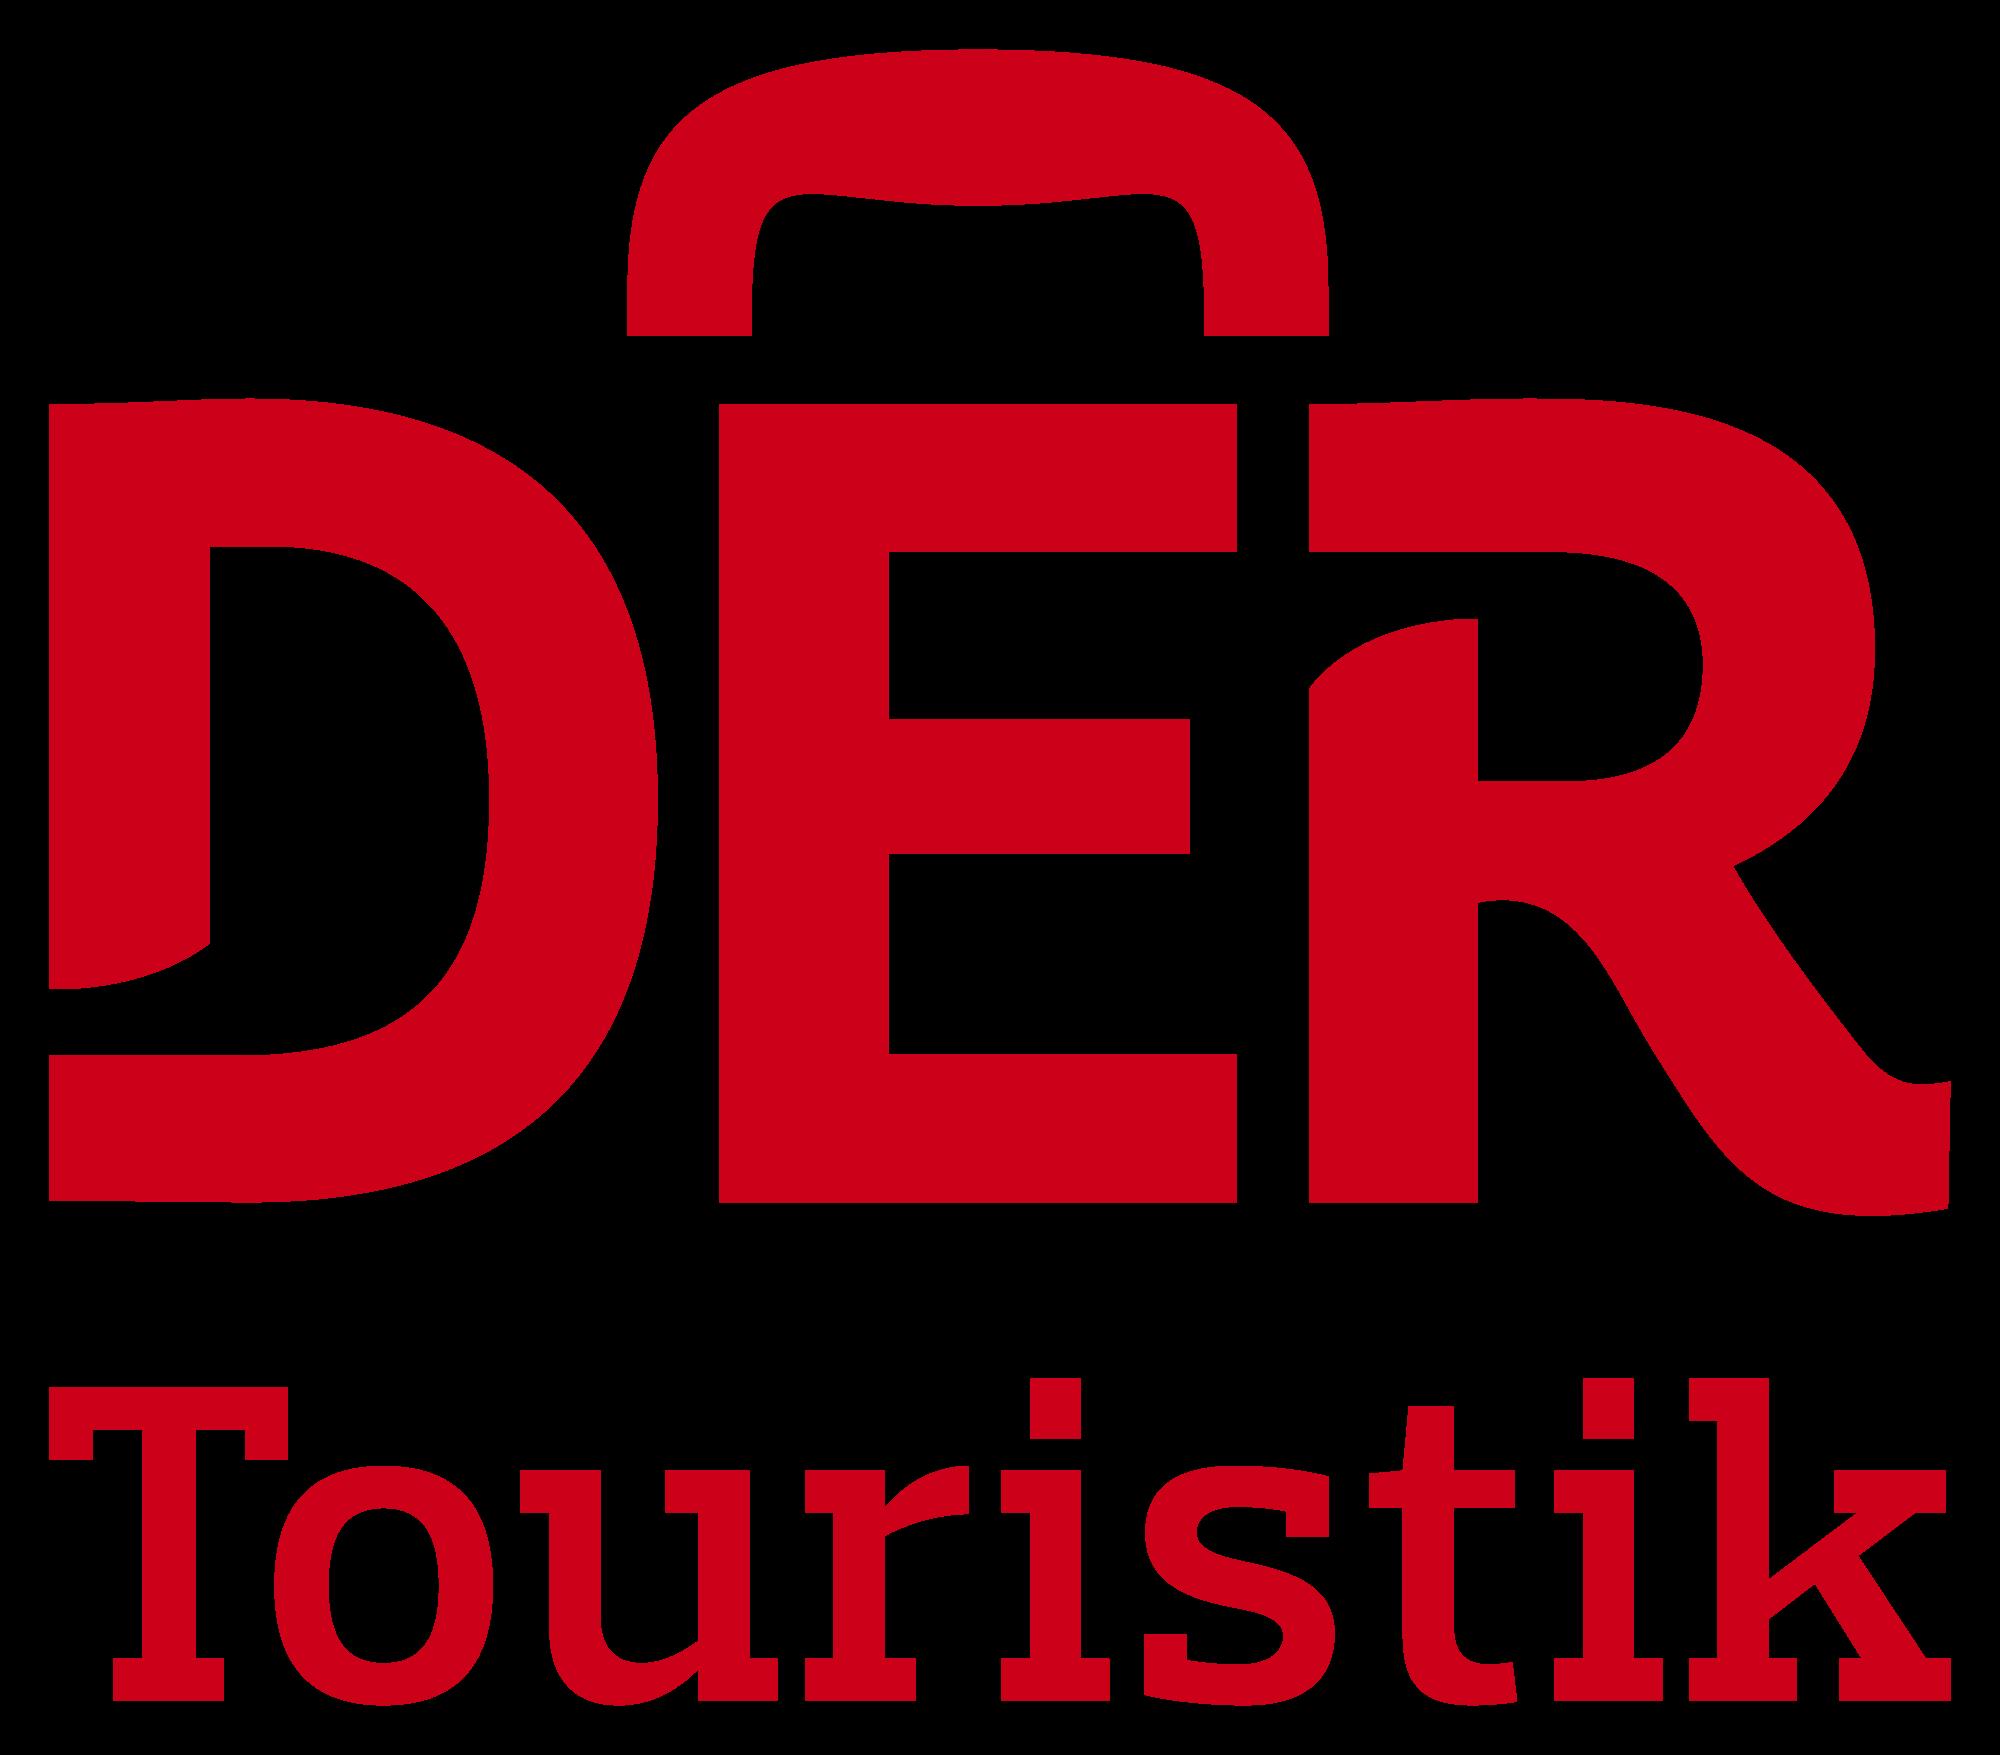 DER_Touristik_logo